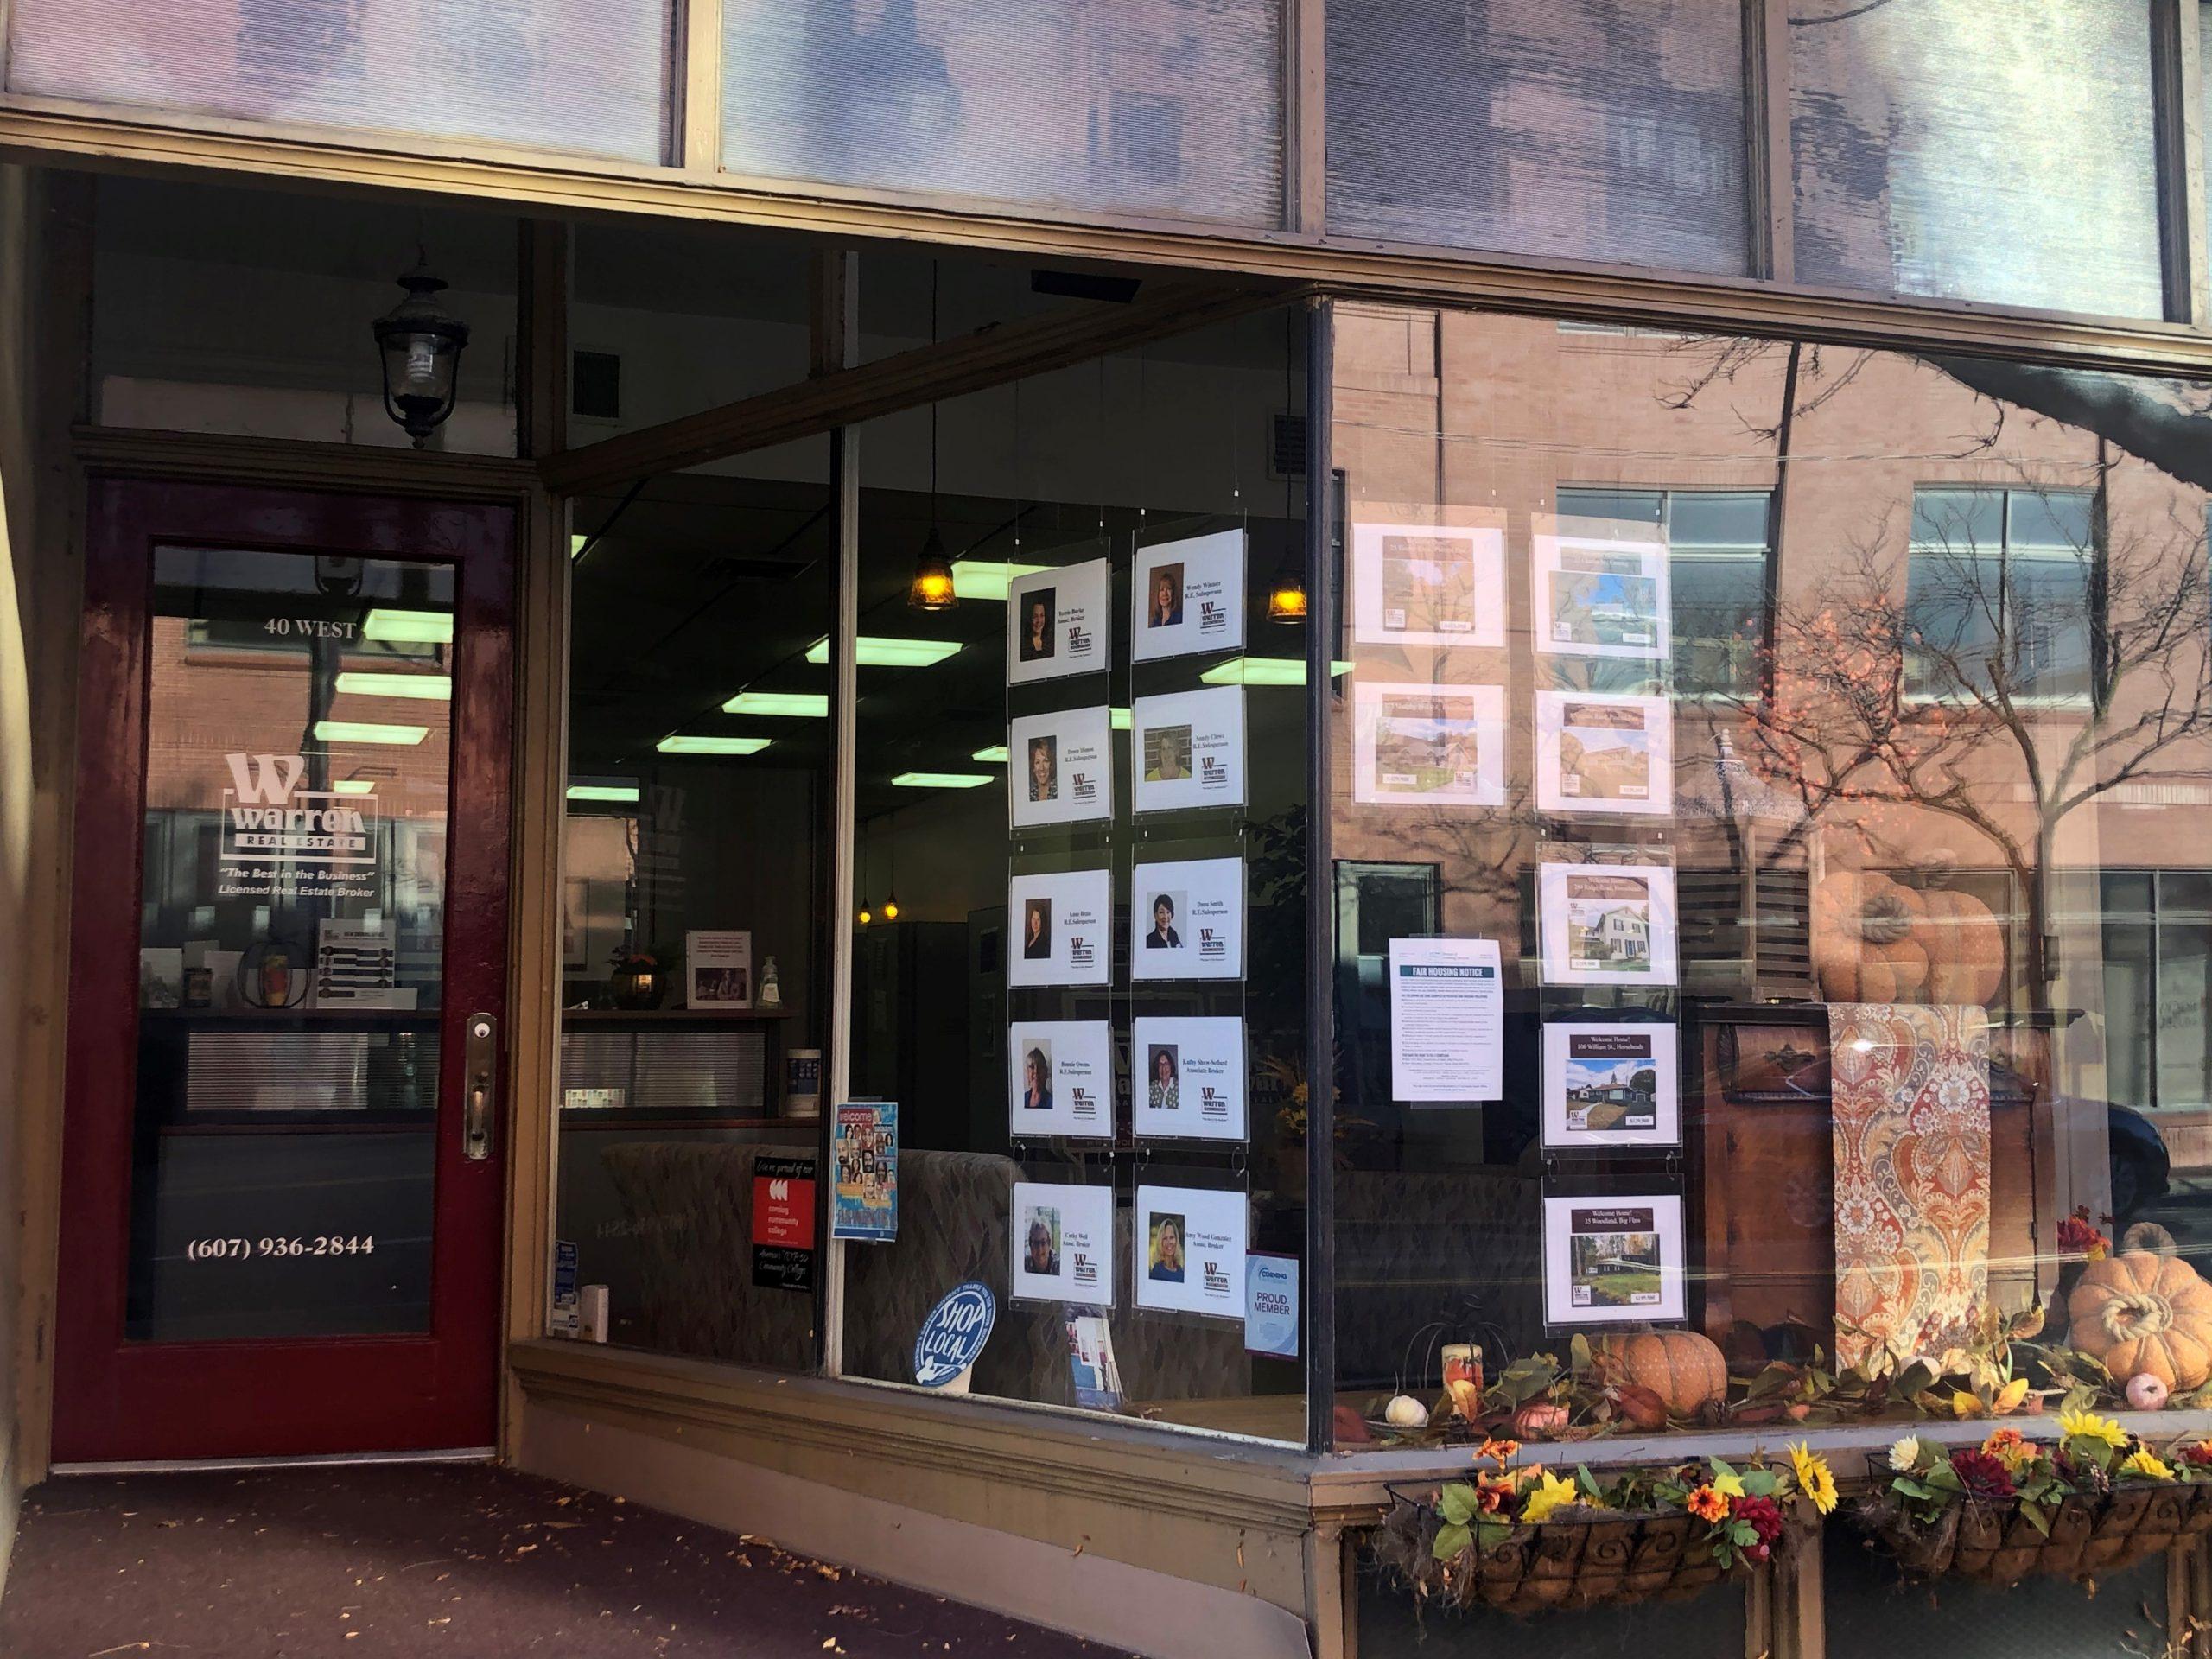 Warren Real Estate 40 West Market Street